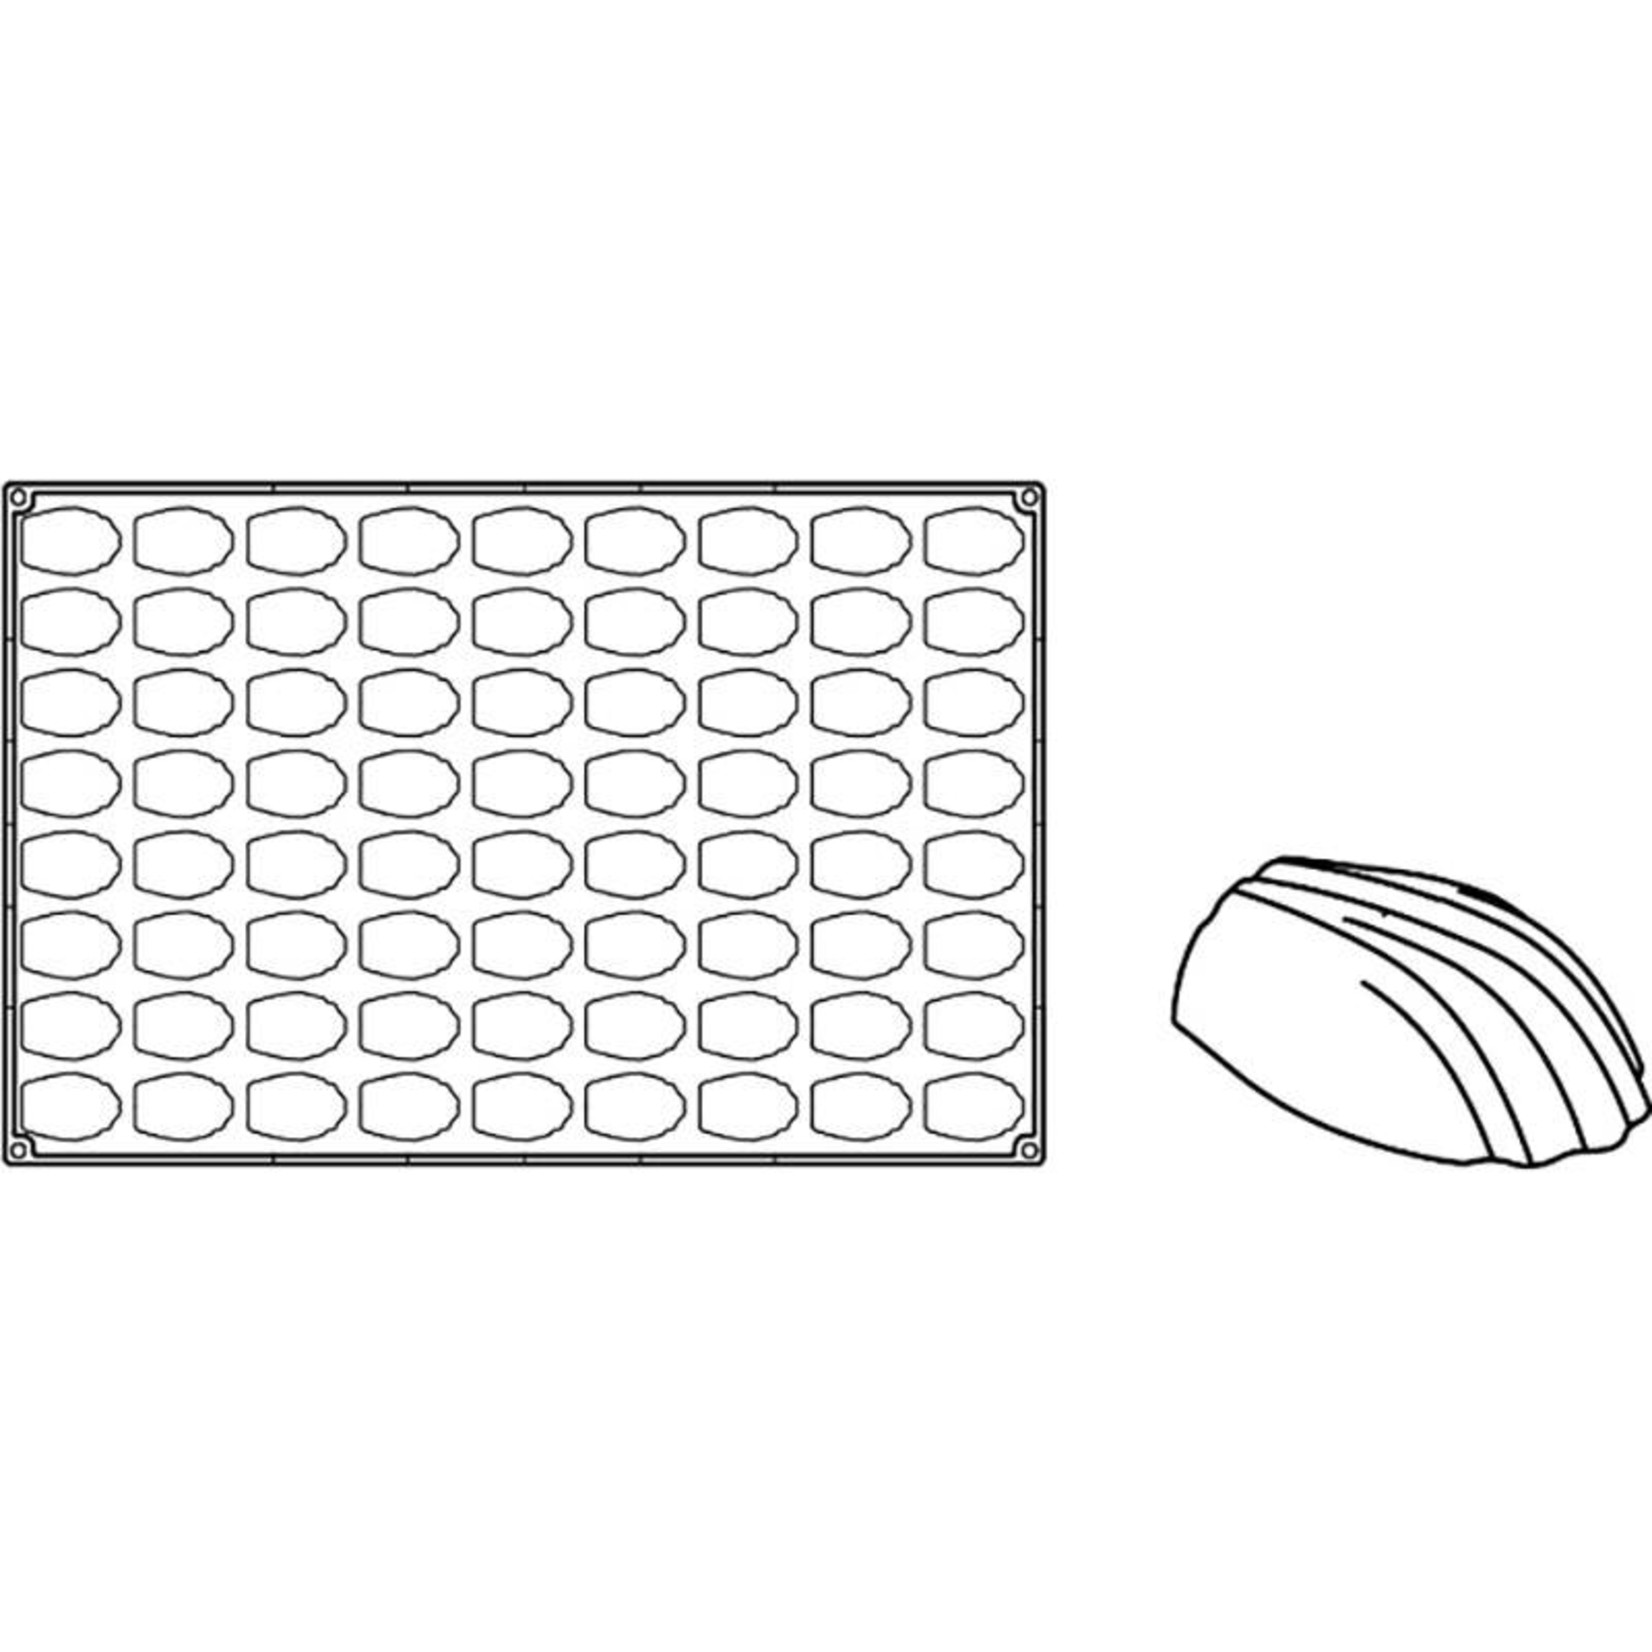 Pavoni Pavoni - Pavoflex silicone mold, Mini madeleine, Mignon (72 cavity), PX305